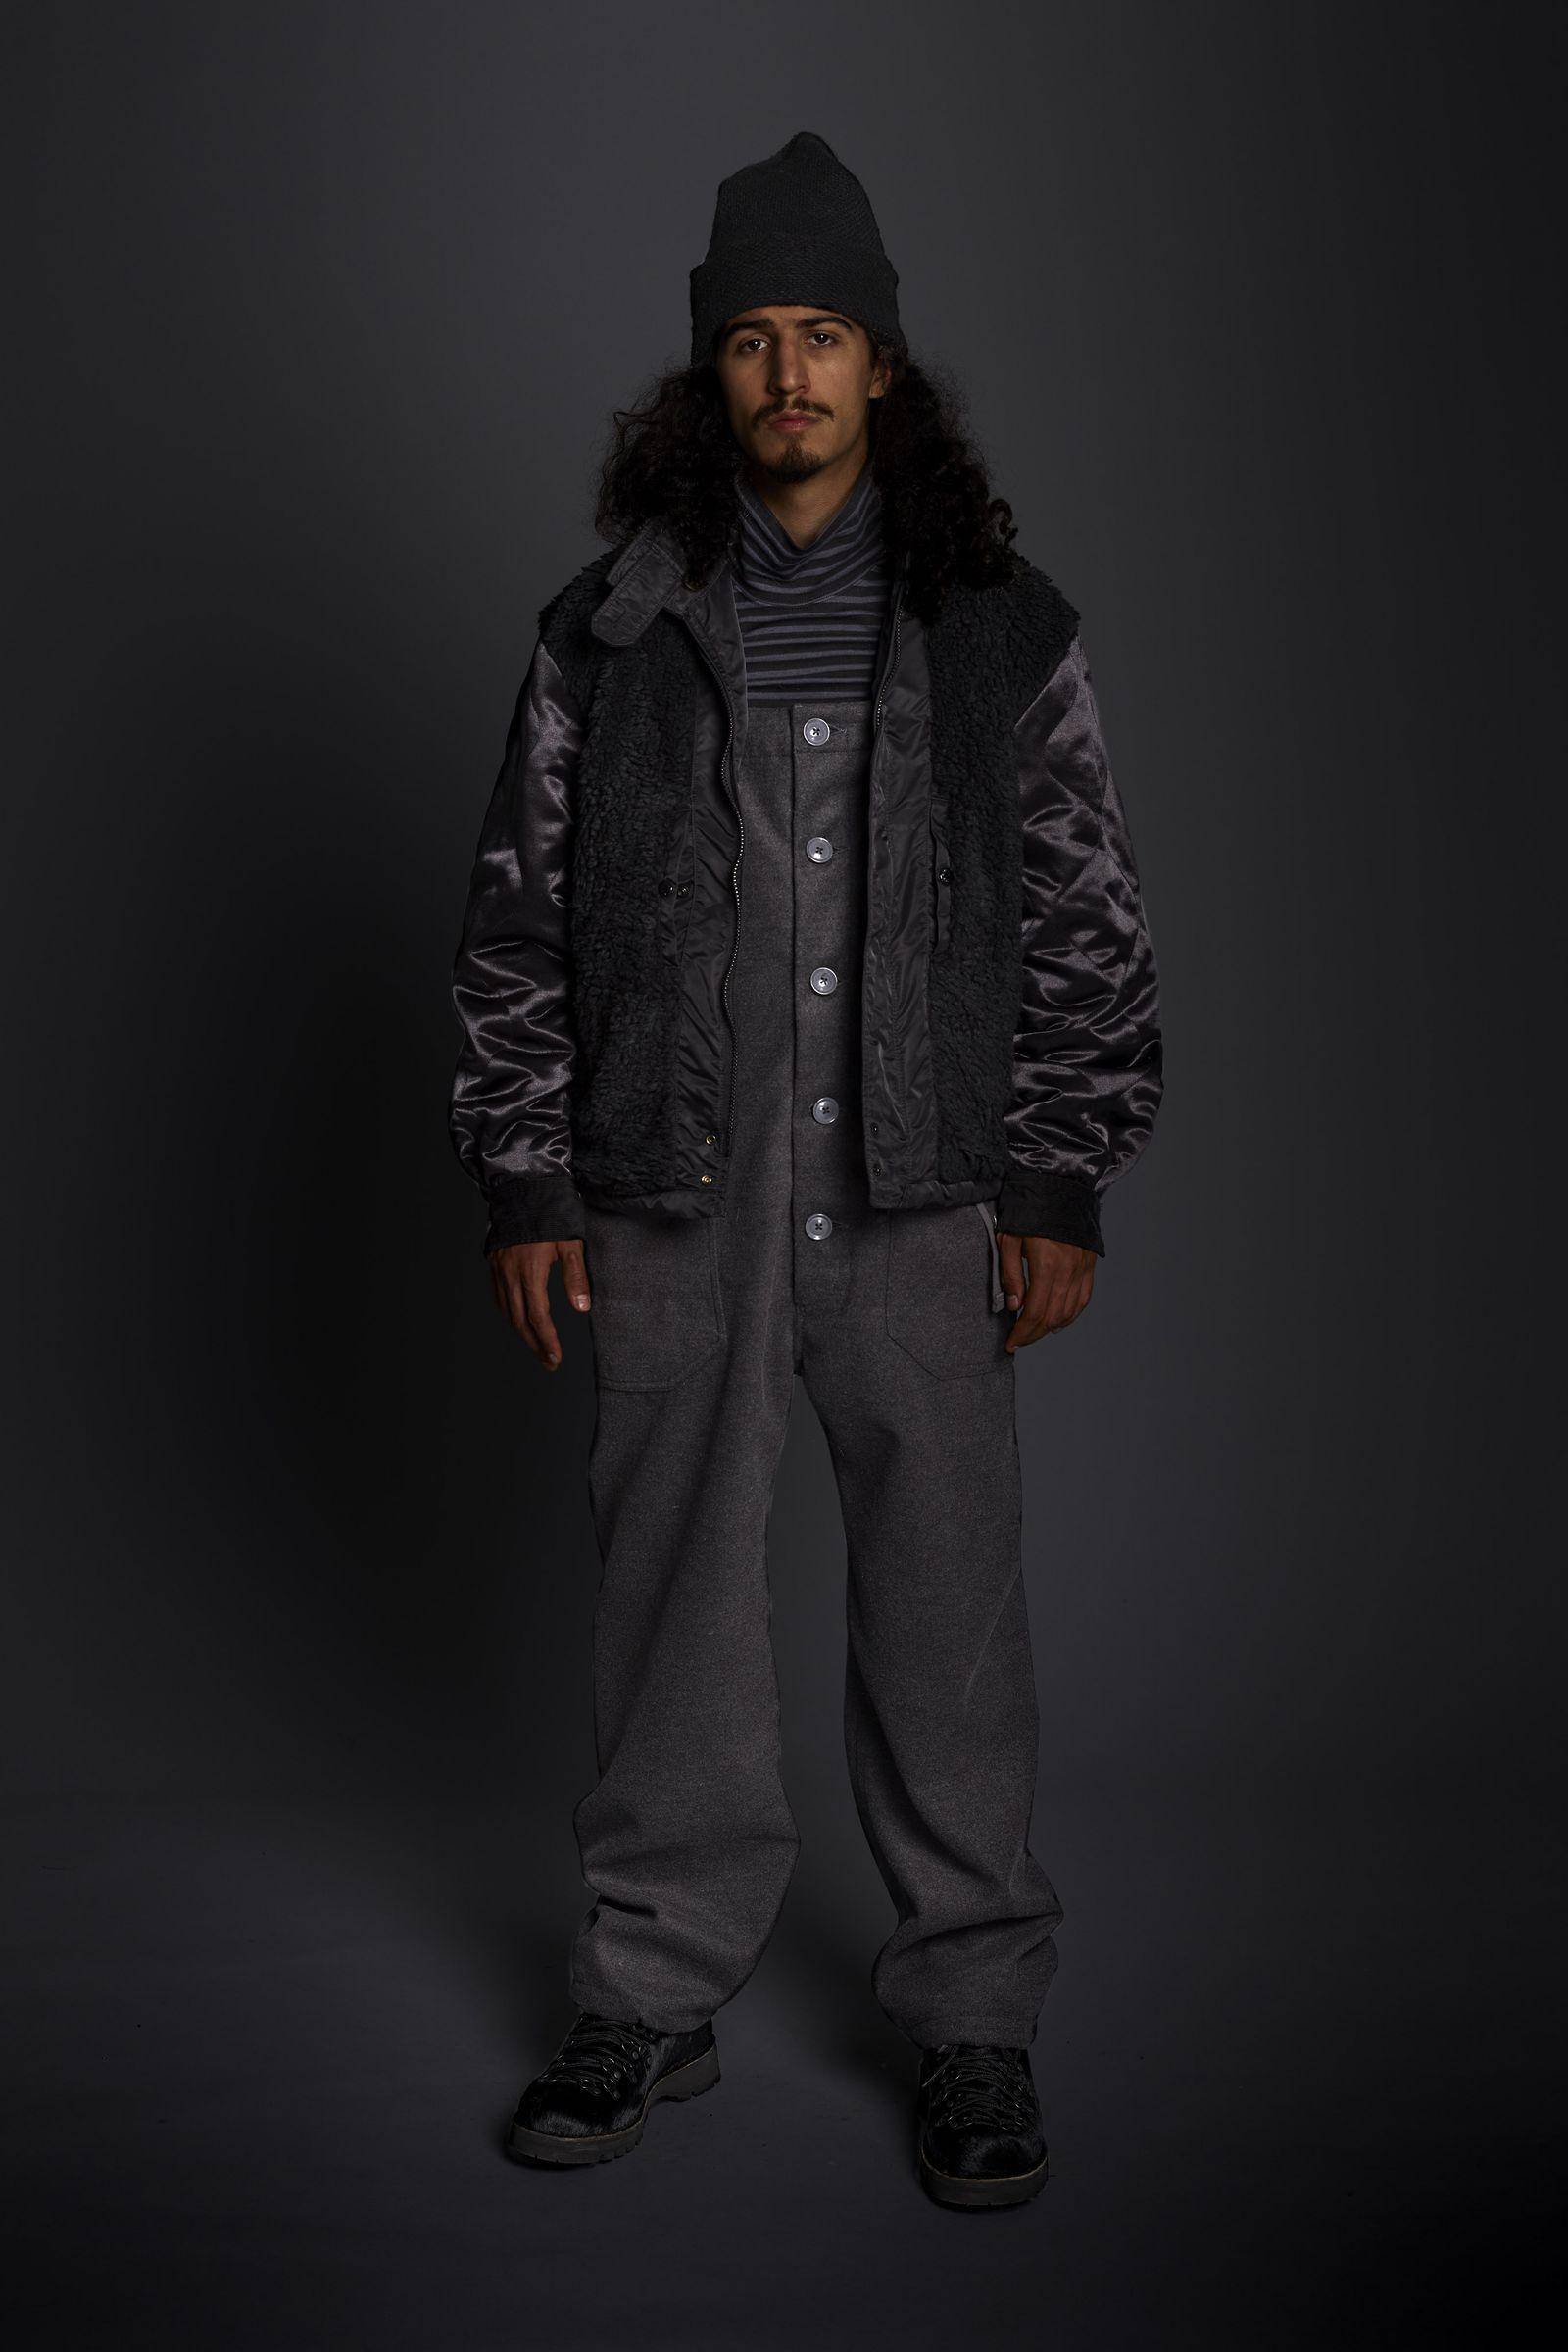 engineered-garments-fall-winter-2020-32